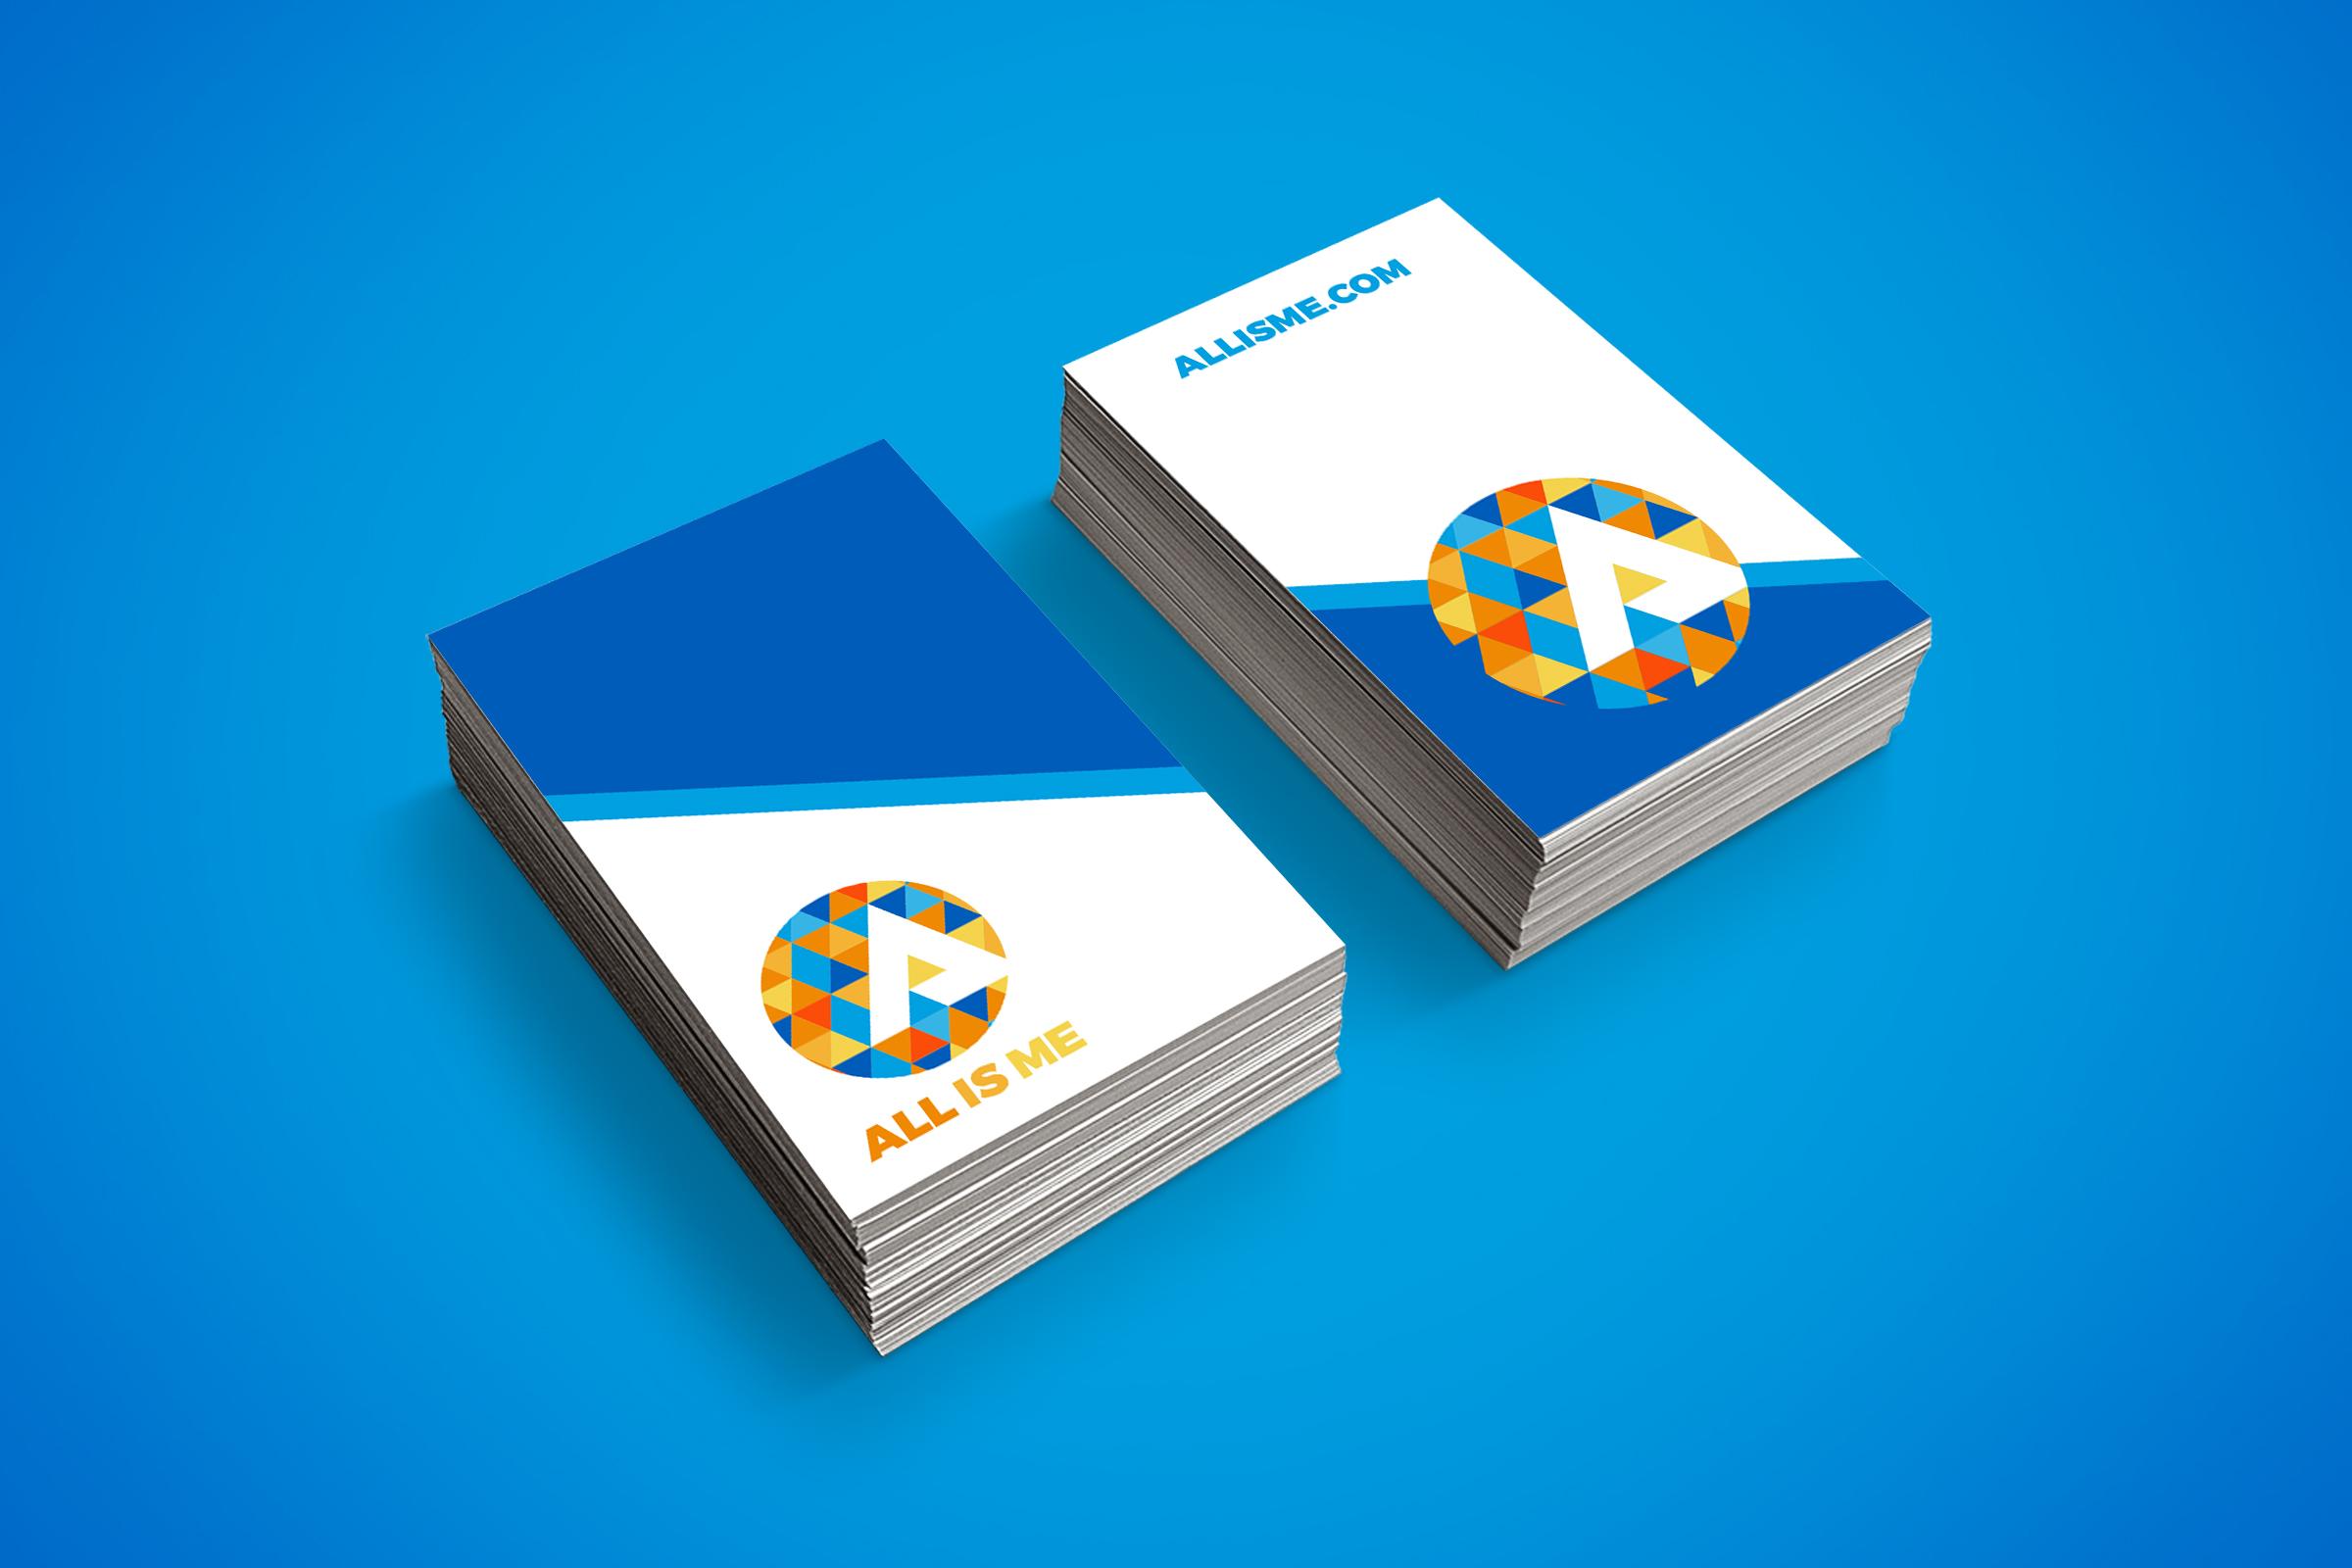 hearthfire-creative-logo-brand-identity-designer-denver-colorado-all-is-me-4.jpg